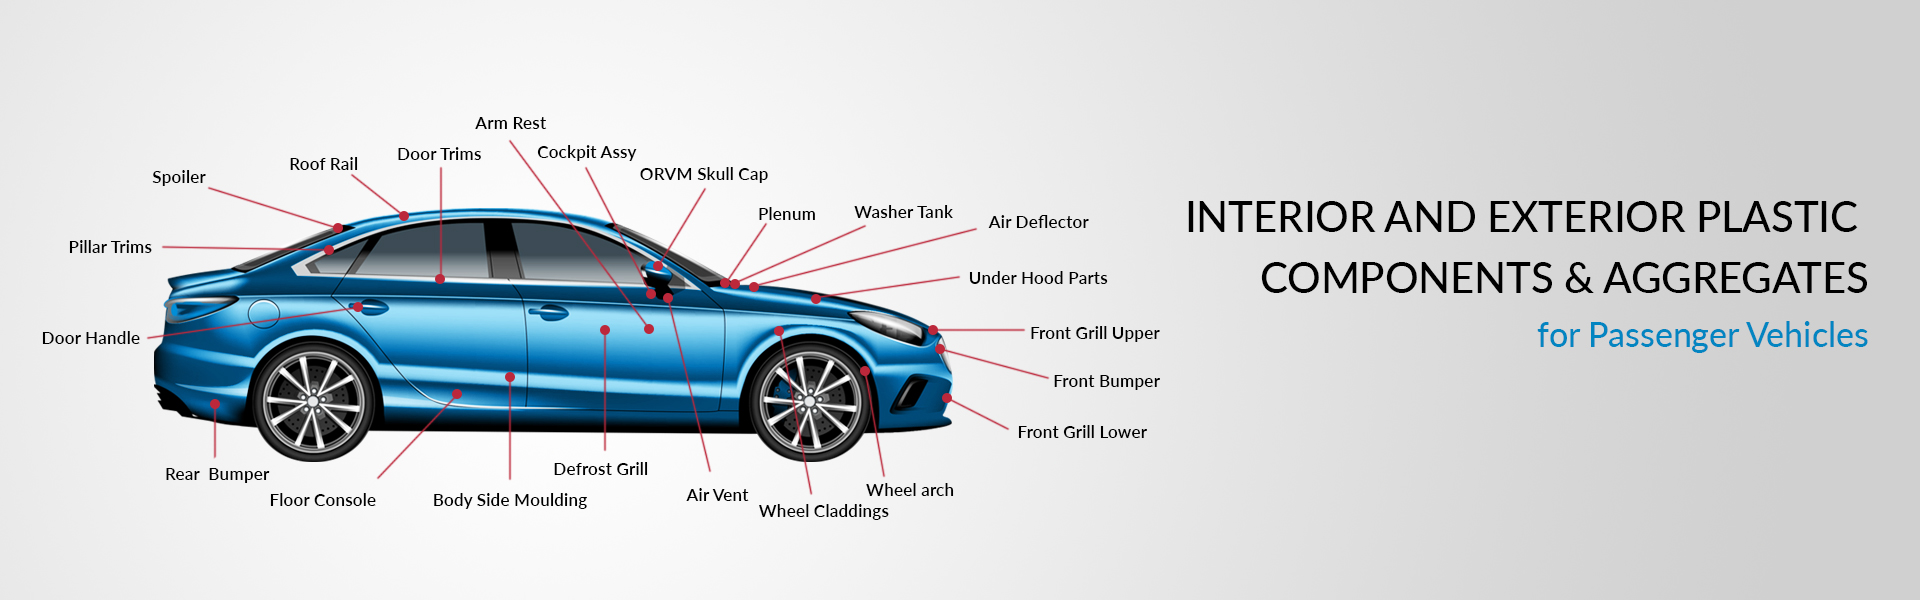 Tata Autocomp Systems Interiors And Plastics Division